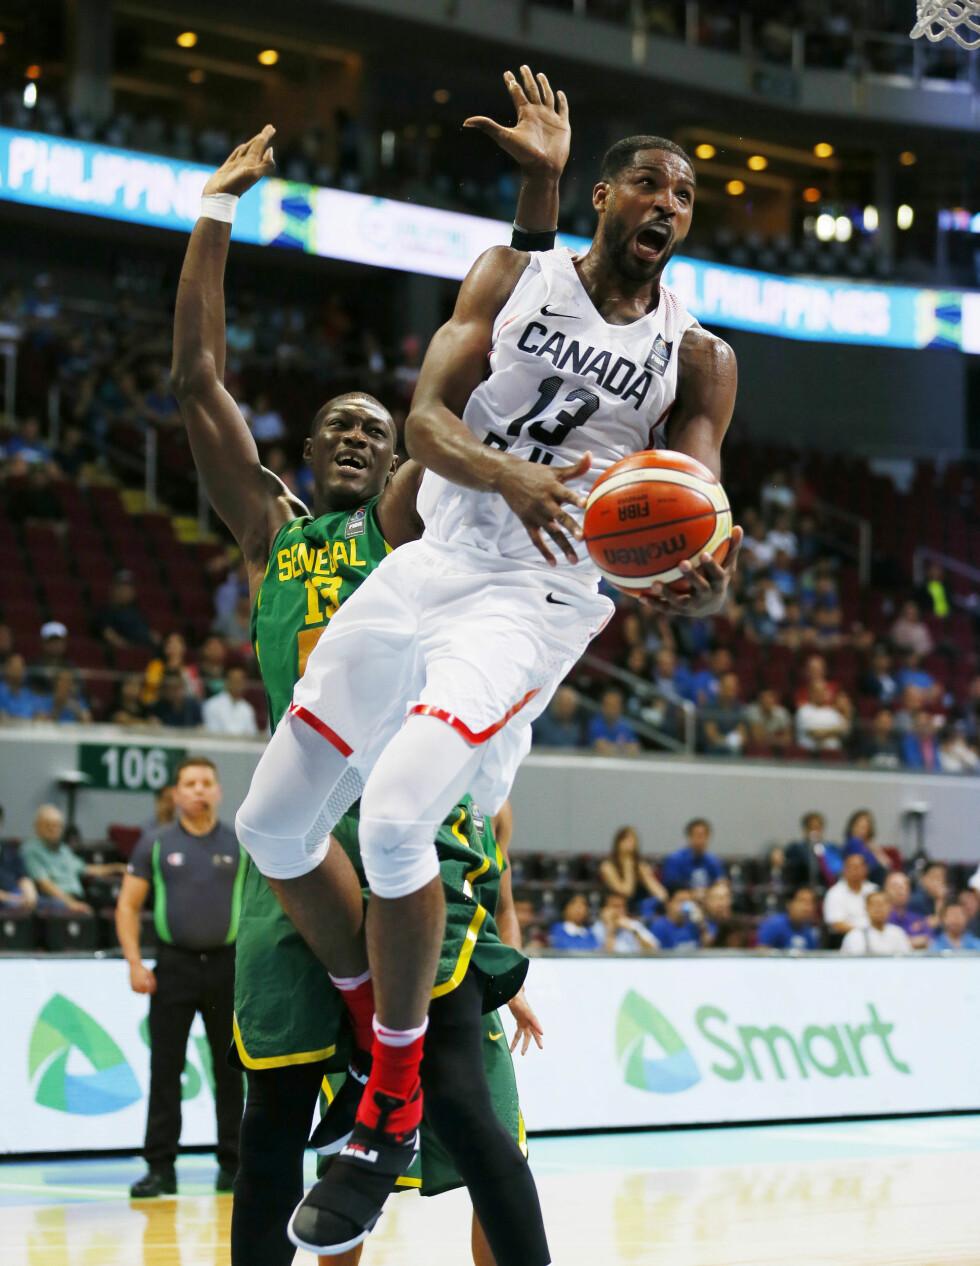 IDRETTSSTJERNE: Tristan Thompson (t.h) spiller for basketballaget Cleveland Cavaliers.  Foto: Ap